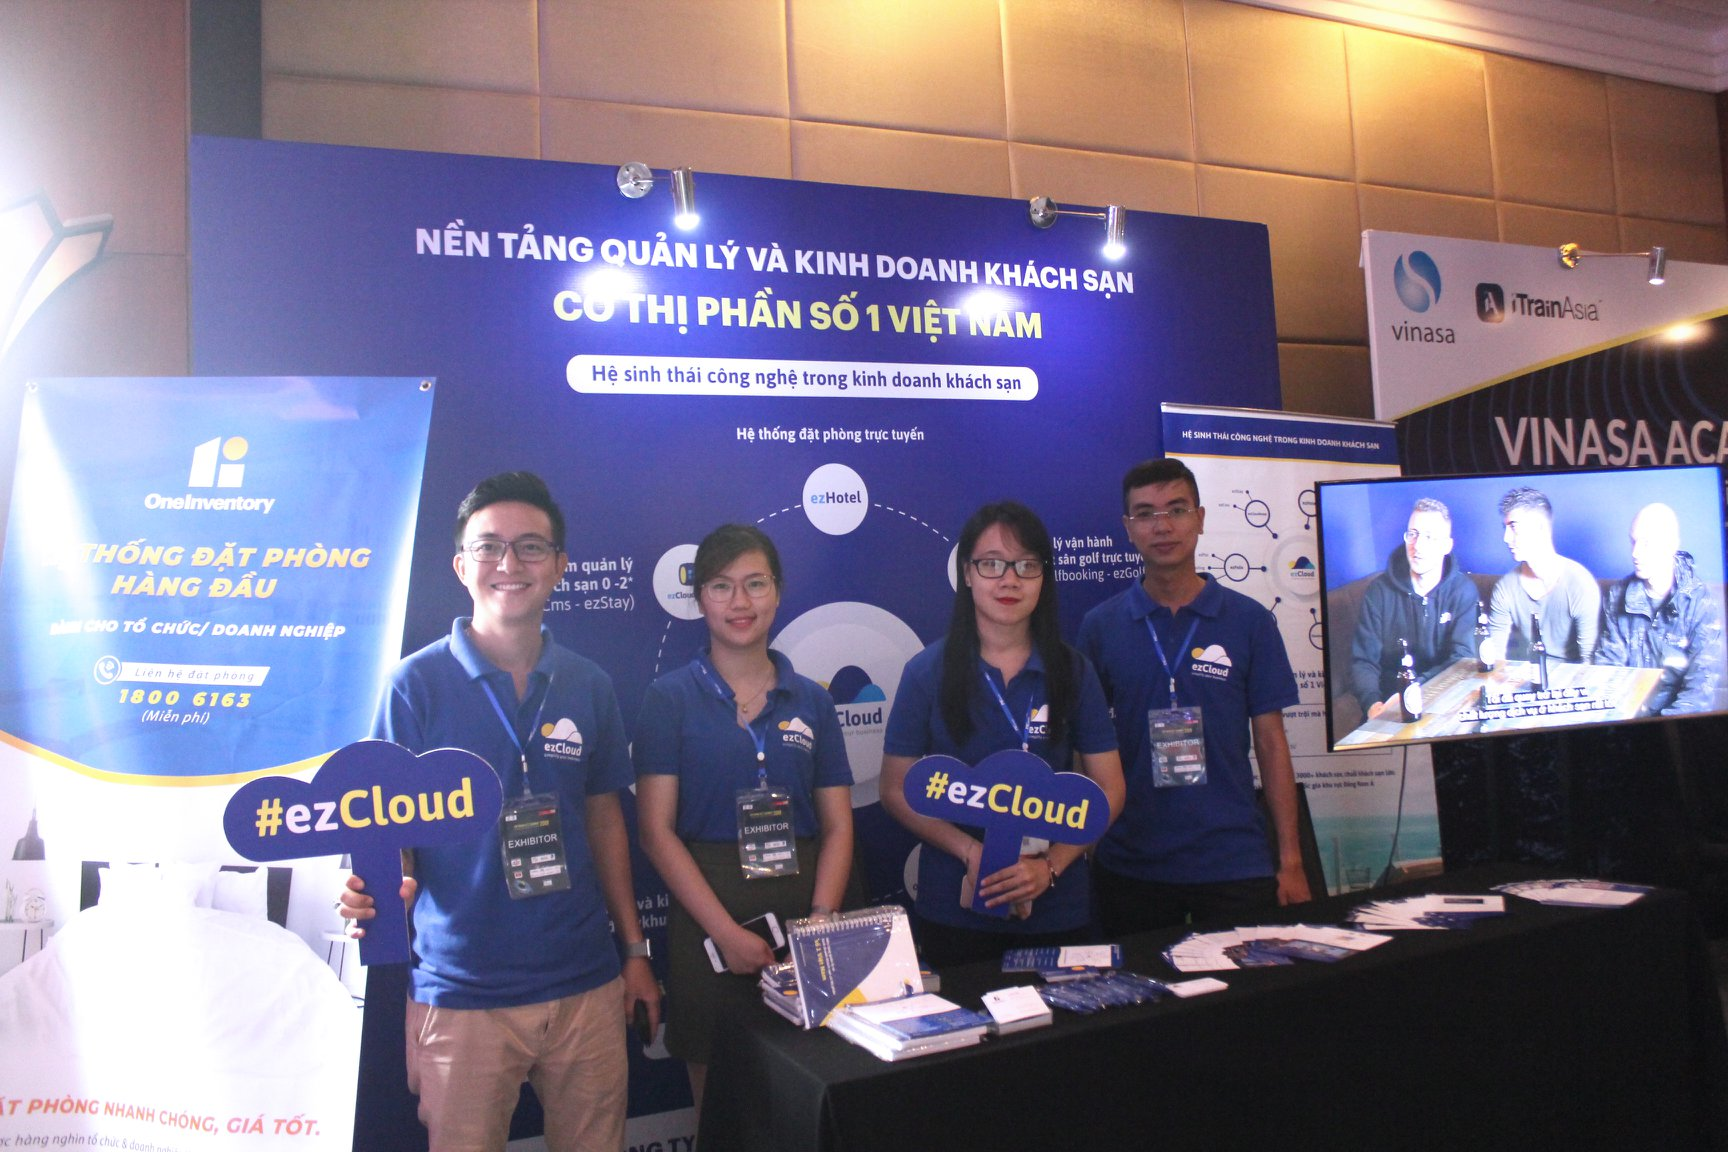 Gian hàng ezCloud tại sự kiện Vietnam ICT Summit 2019